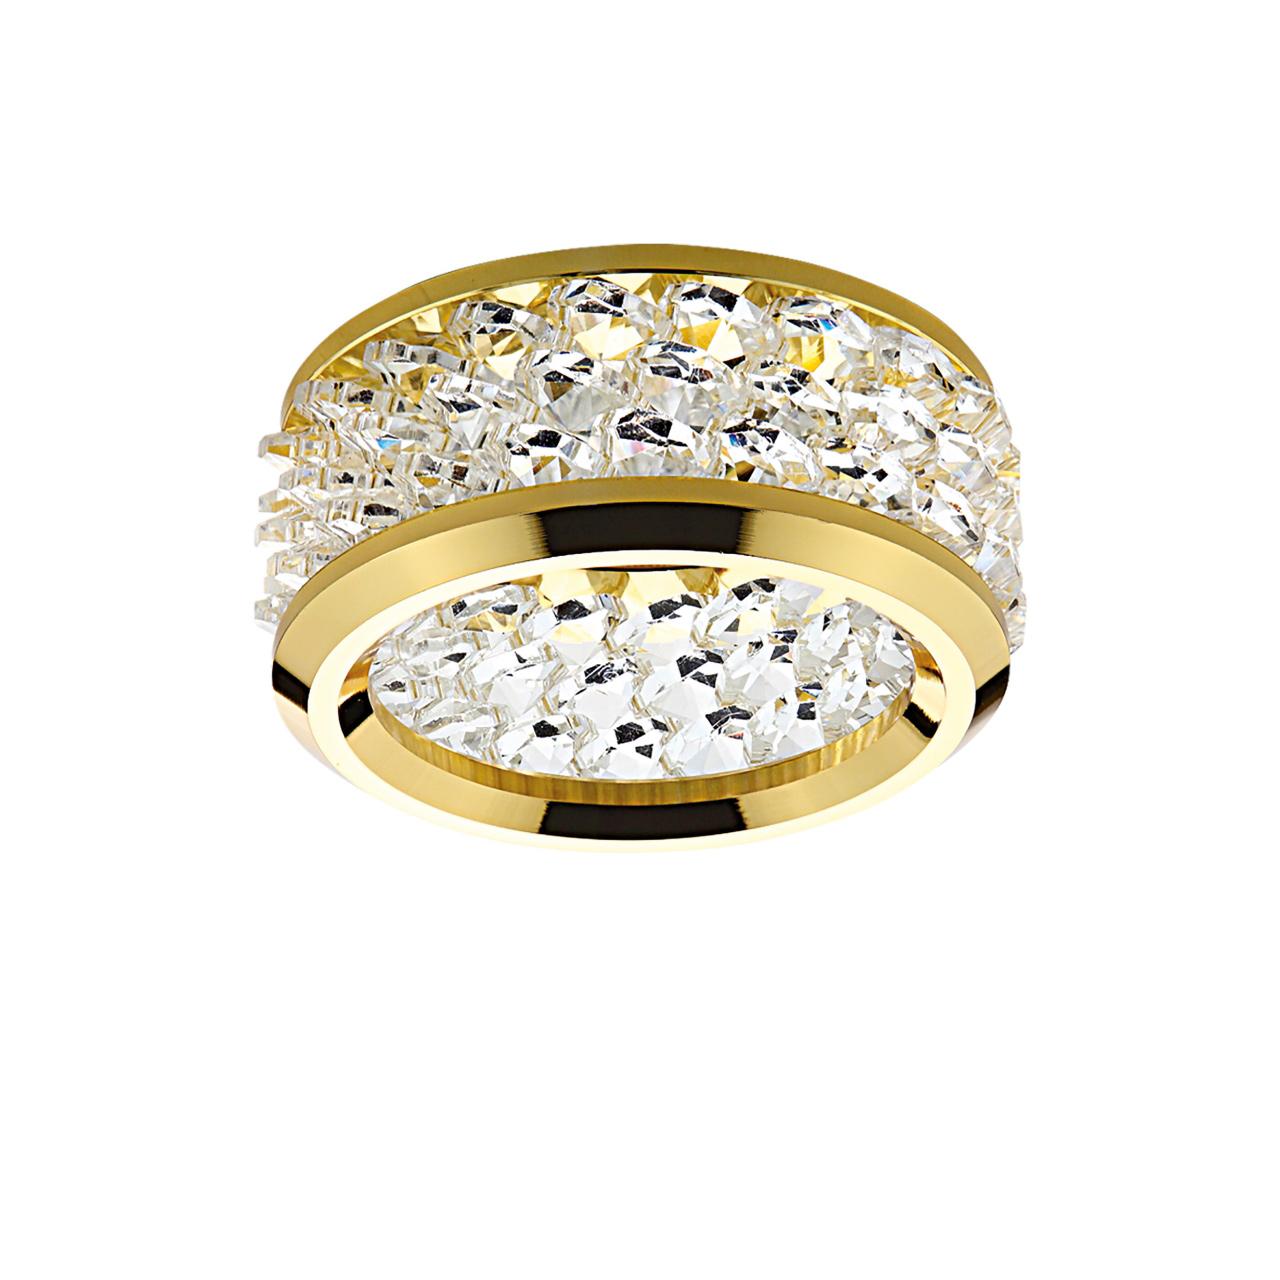 Светильник Onora grande MR16 / HP16 золото / прозрачный Lightstar 031802